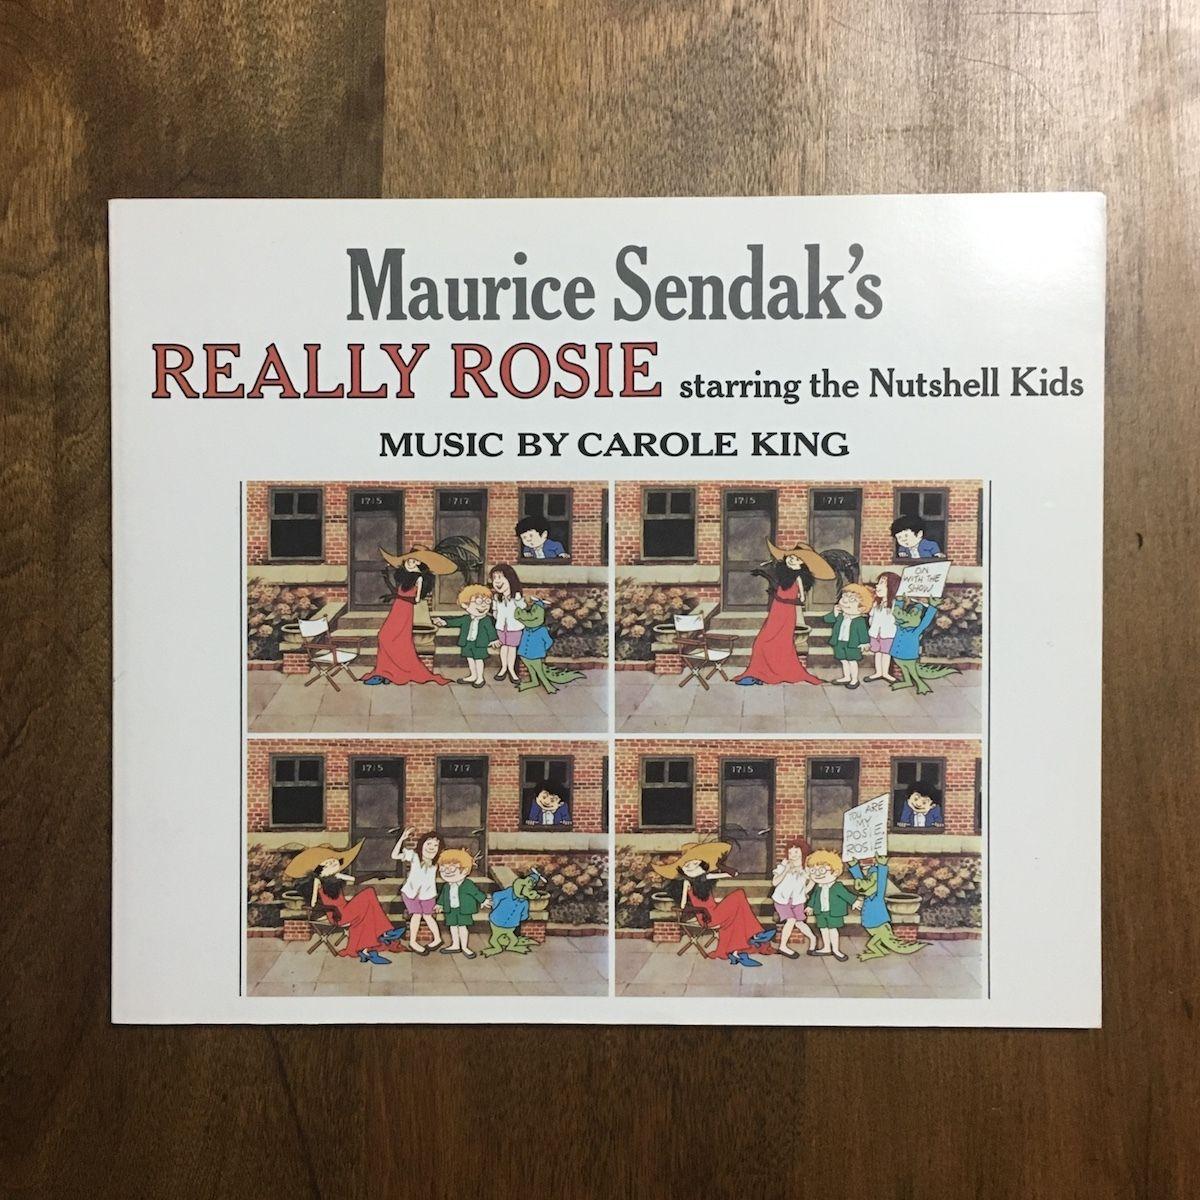 「Maurice Sendak's REALLY ROSIE」Maurice Sendak(モーリス・センダック) Carole King(キャロル・キング)